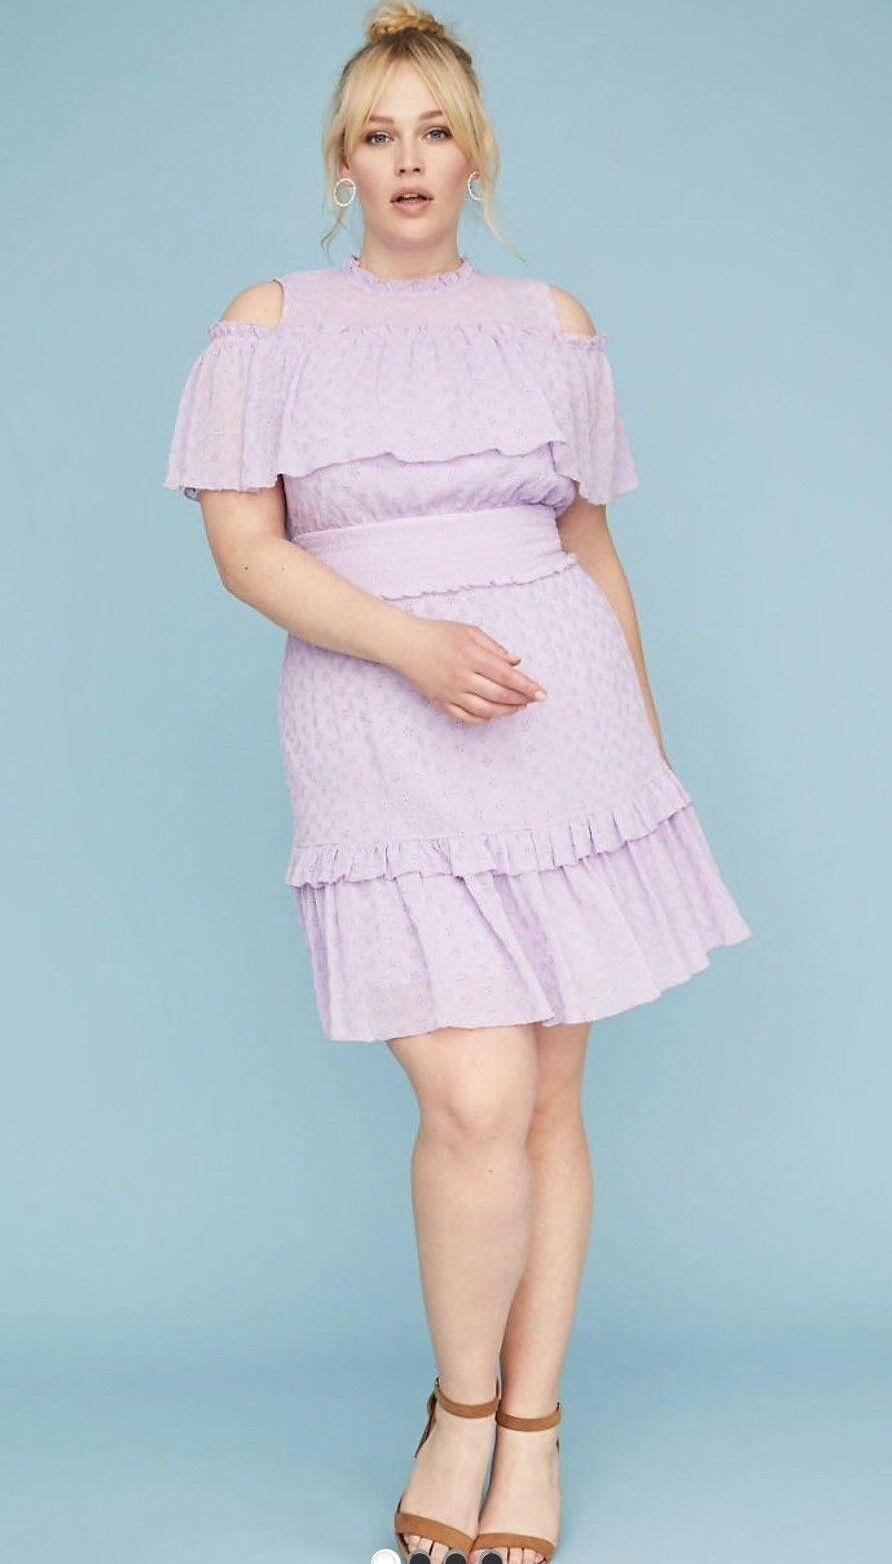 Lane Bryant purplec Eyelet Lace Fit & Flare Cold Shoulder Dress 22 22W 2X 3X